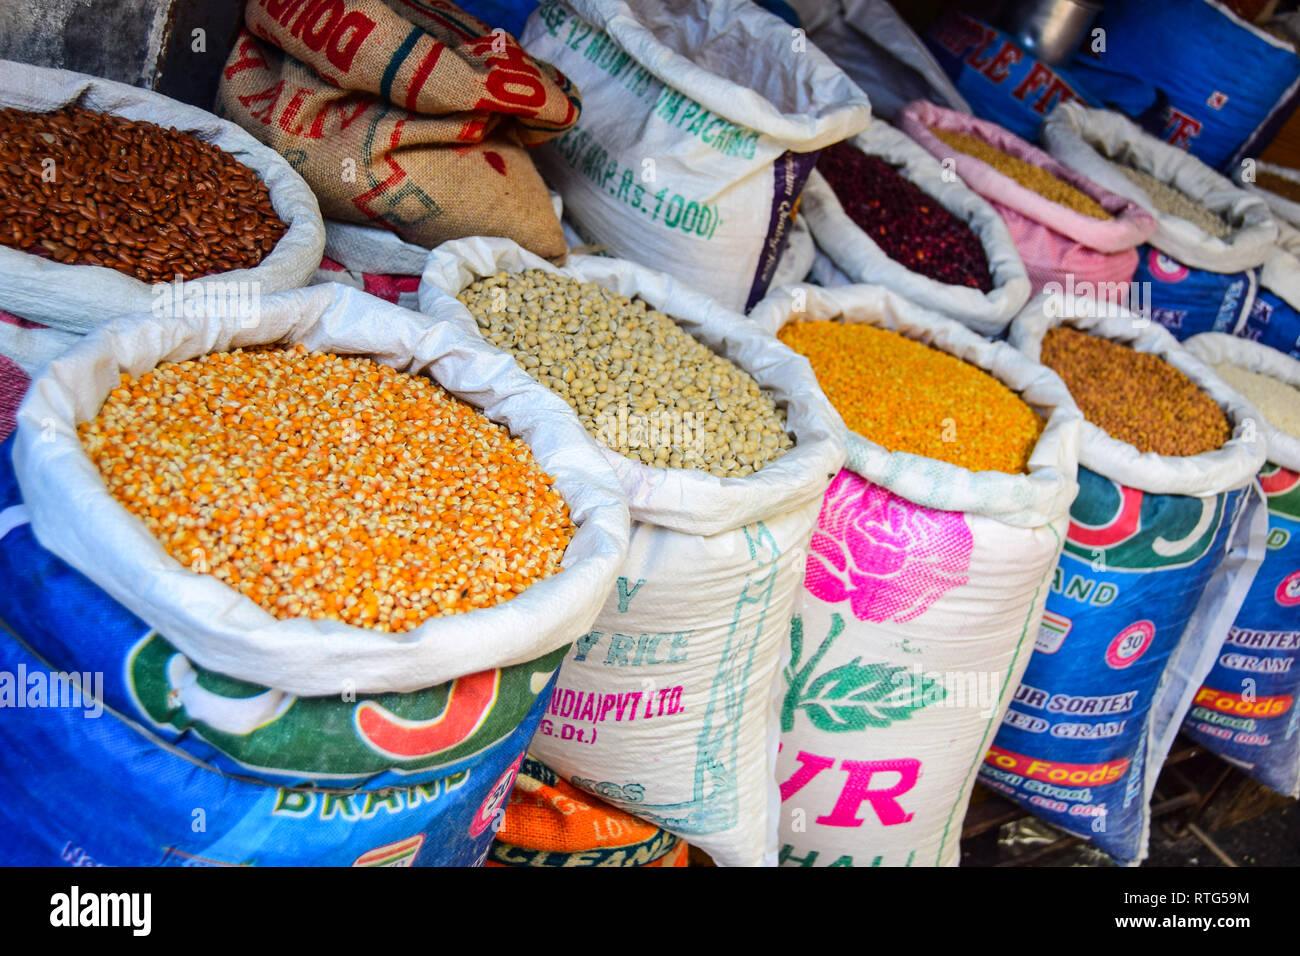 Sacks of Rice Pulses, Goubert Market, Pondicherry, Puducherry, Tamil Nadu, India - Stock Image